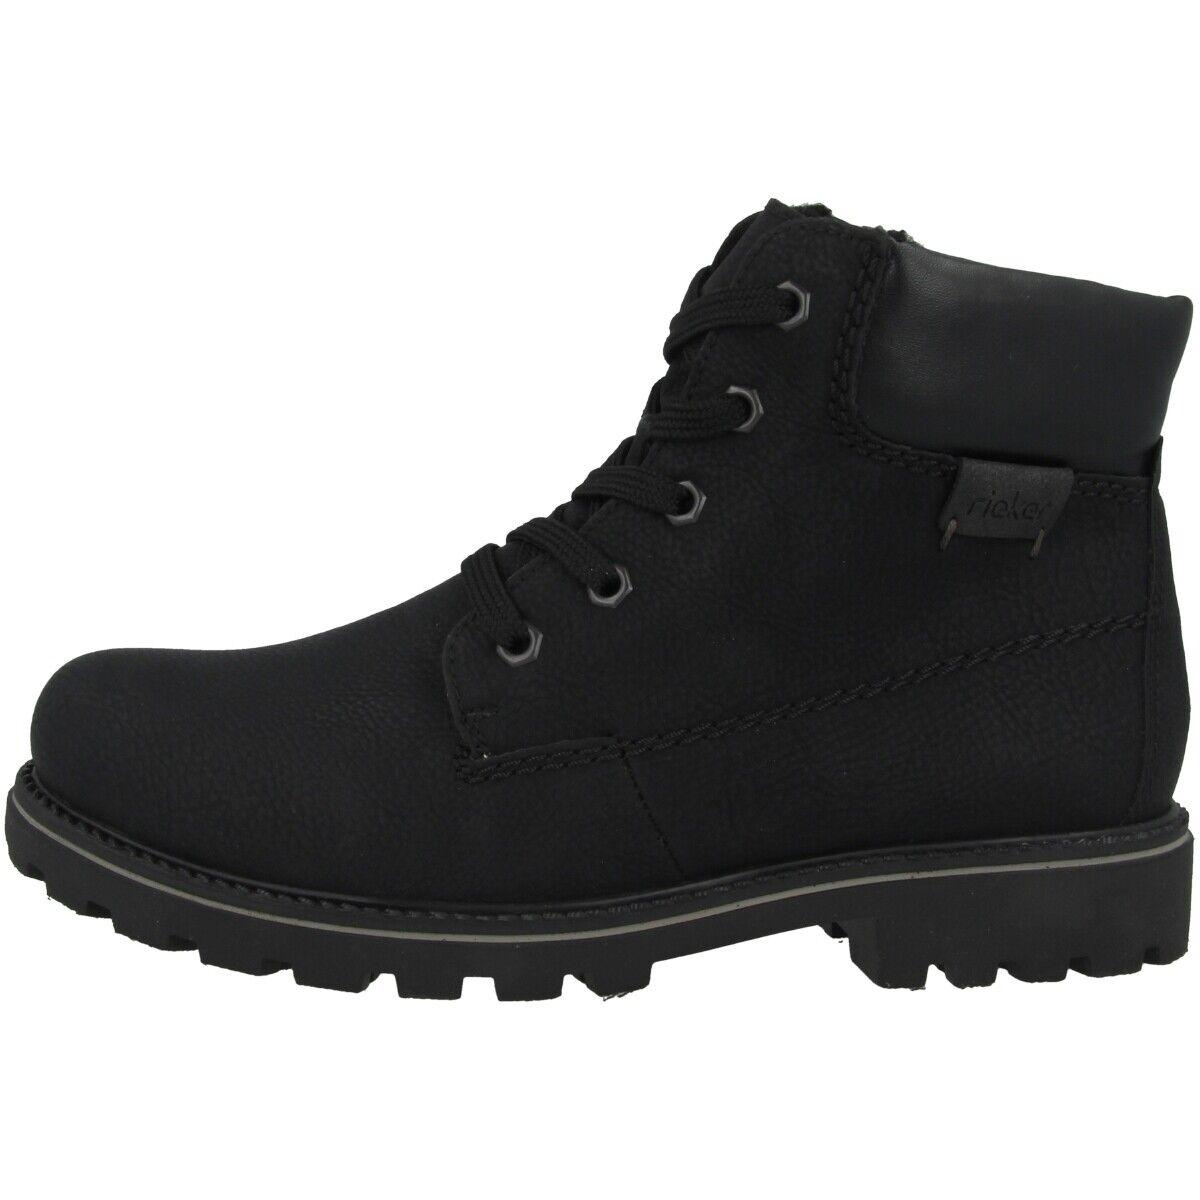 designer fashion c1ba6 2a1dd Namur-Florenz-Napoli Rieker Schuhe Stiefel Z1420-00 schwarz ...